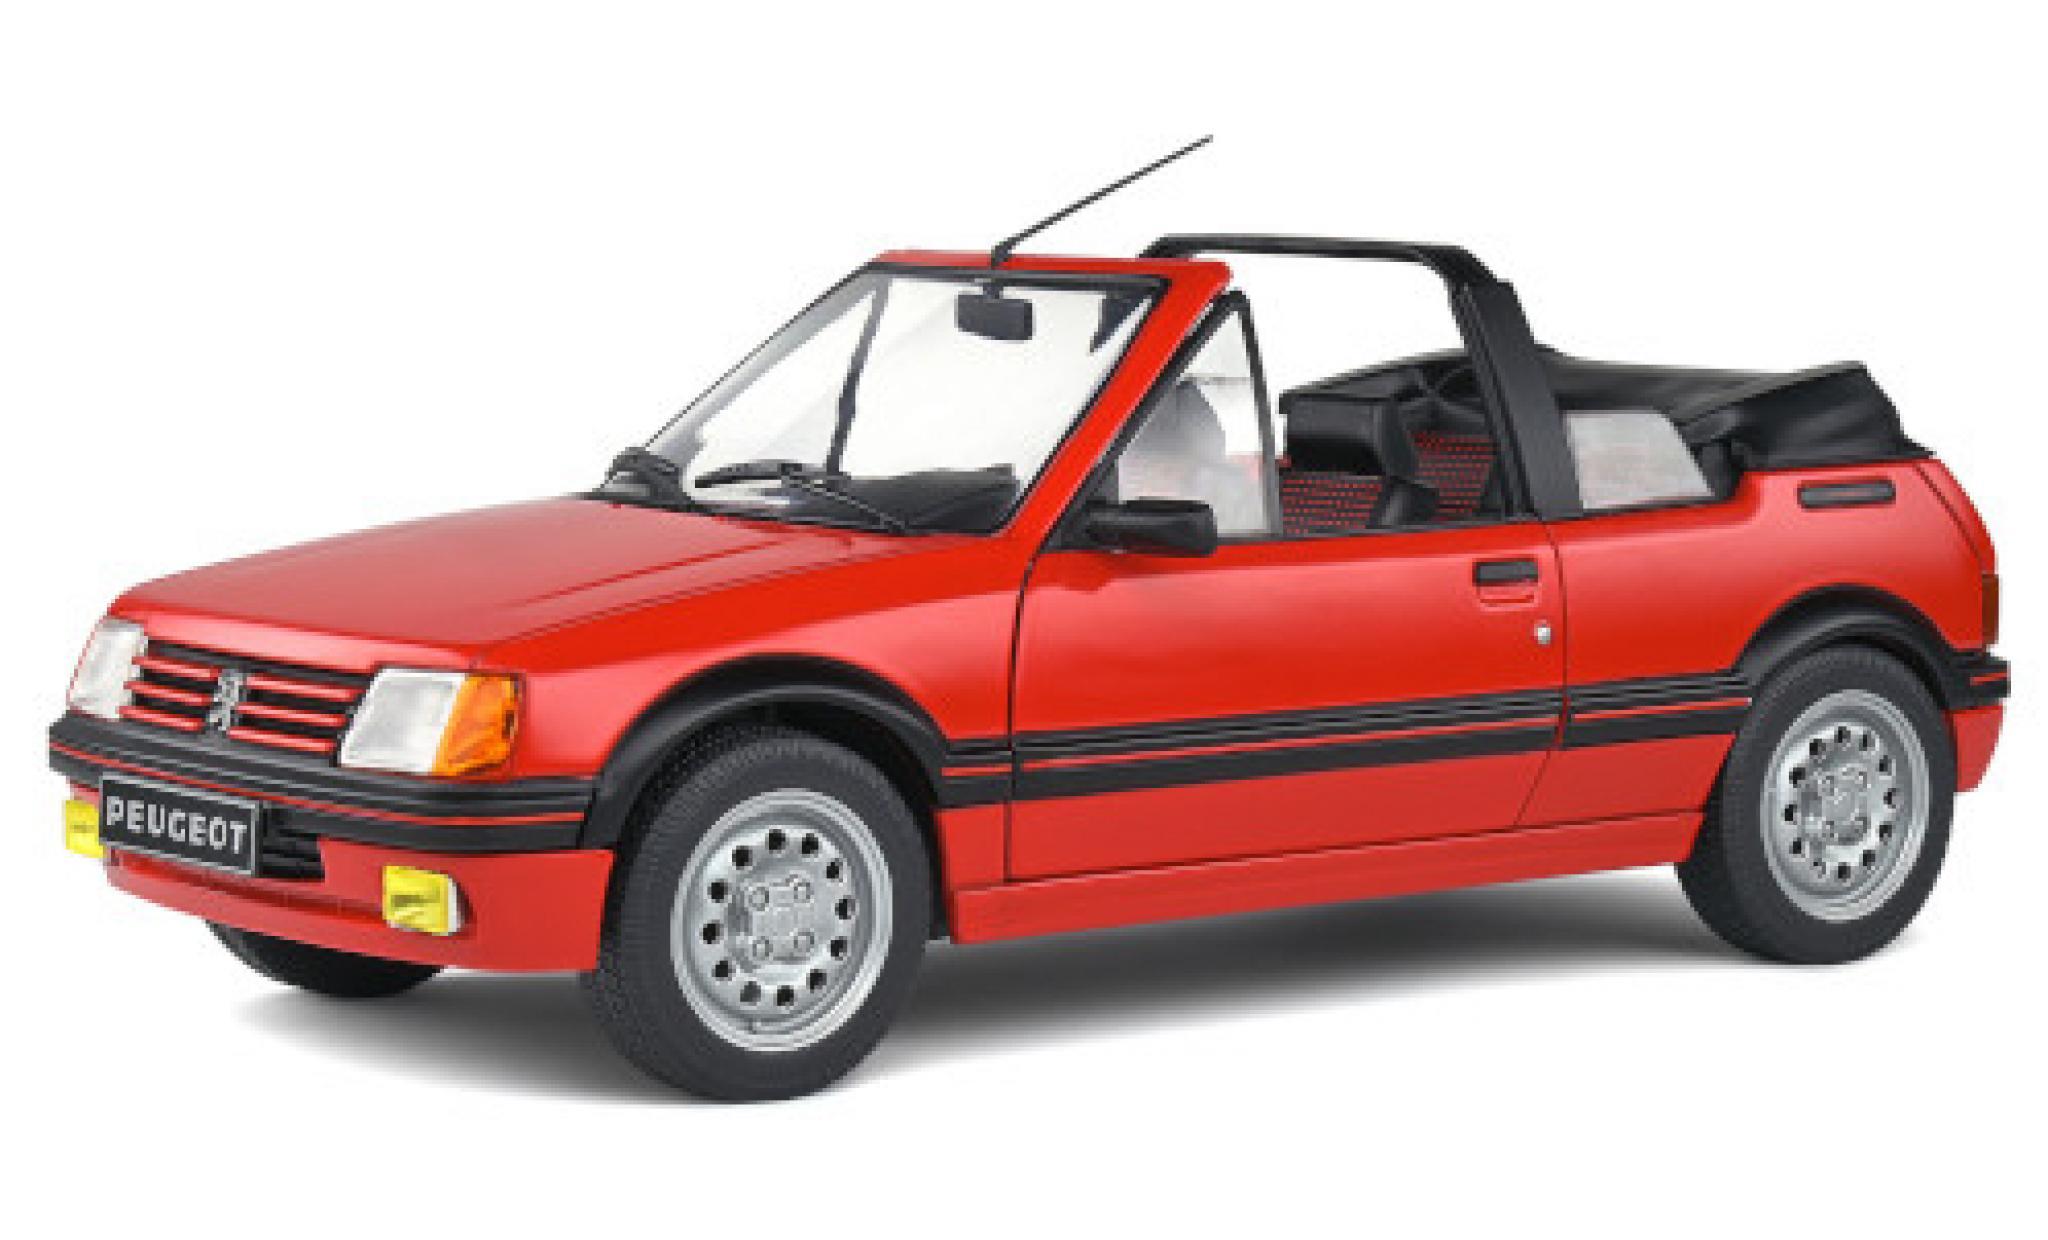 Peugeot 205 1/18 Solido CTI rouge 1986